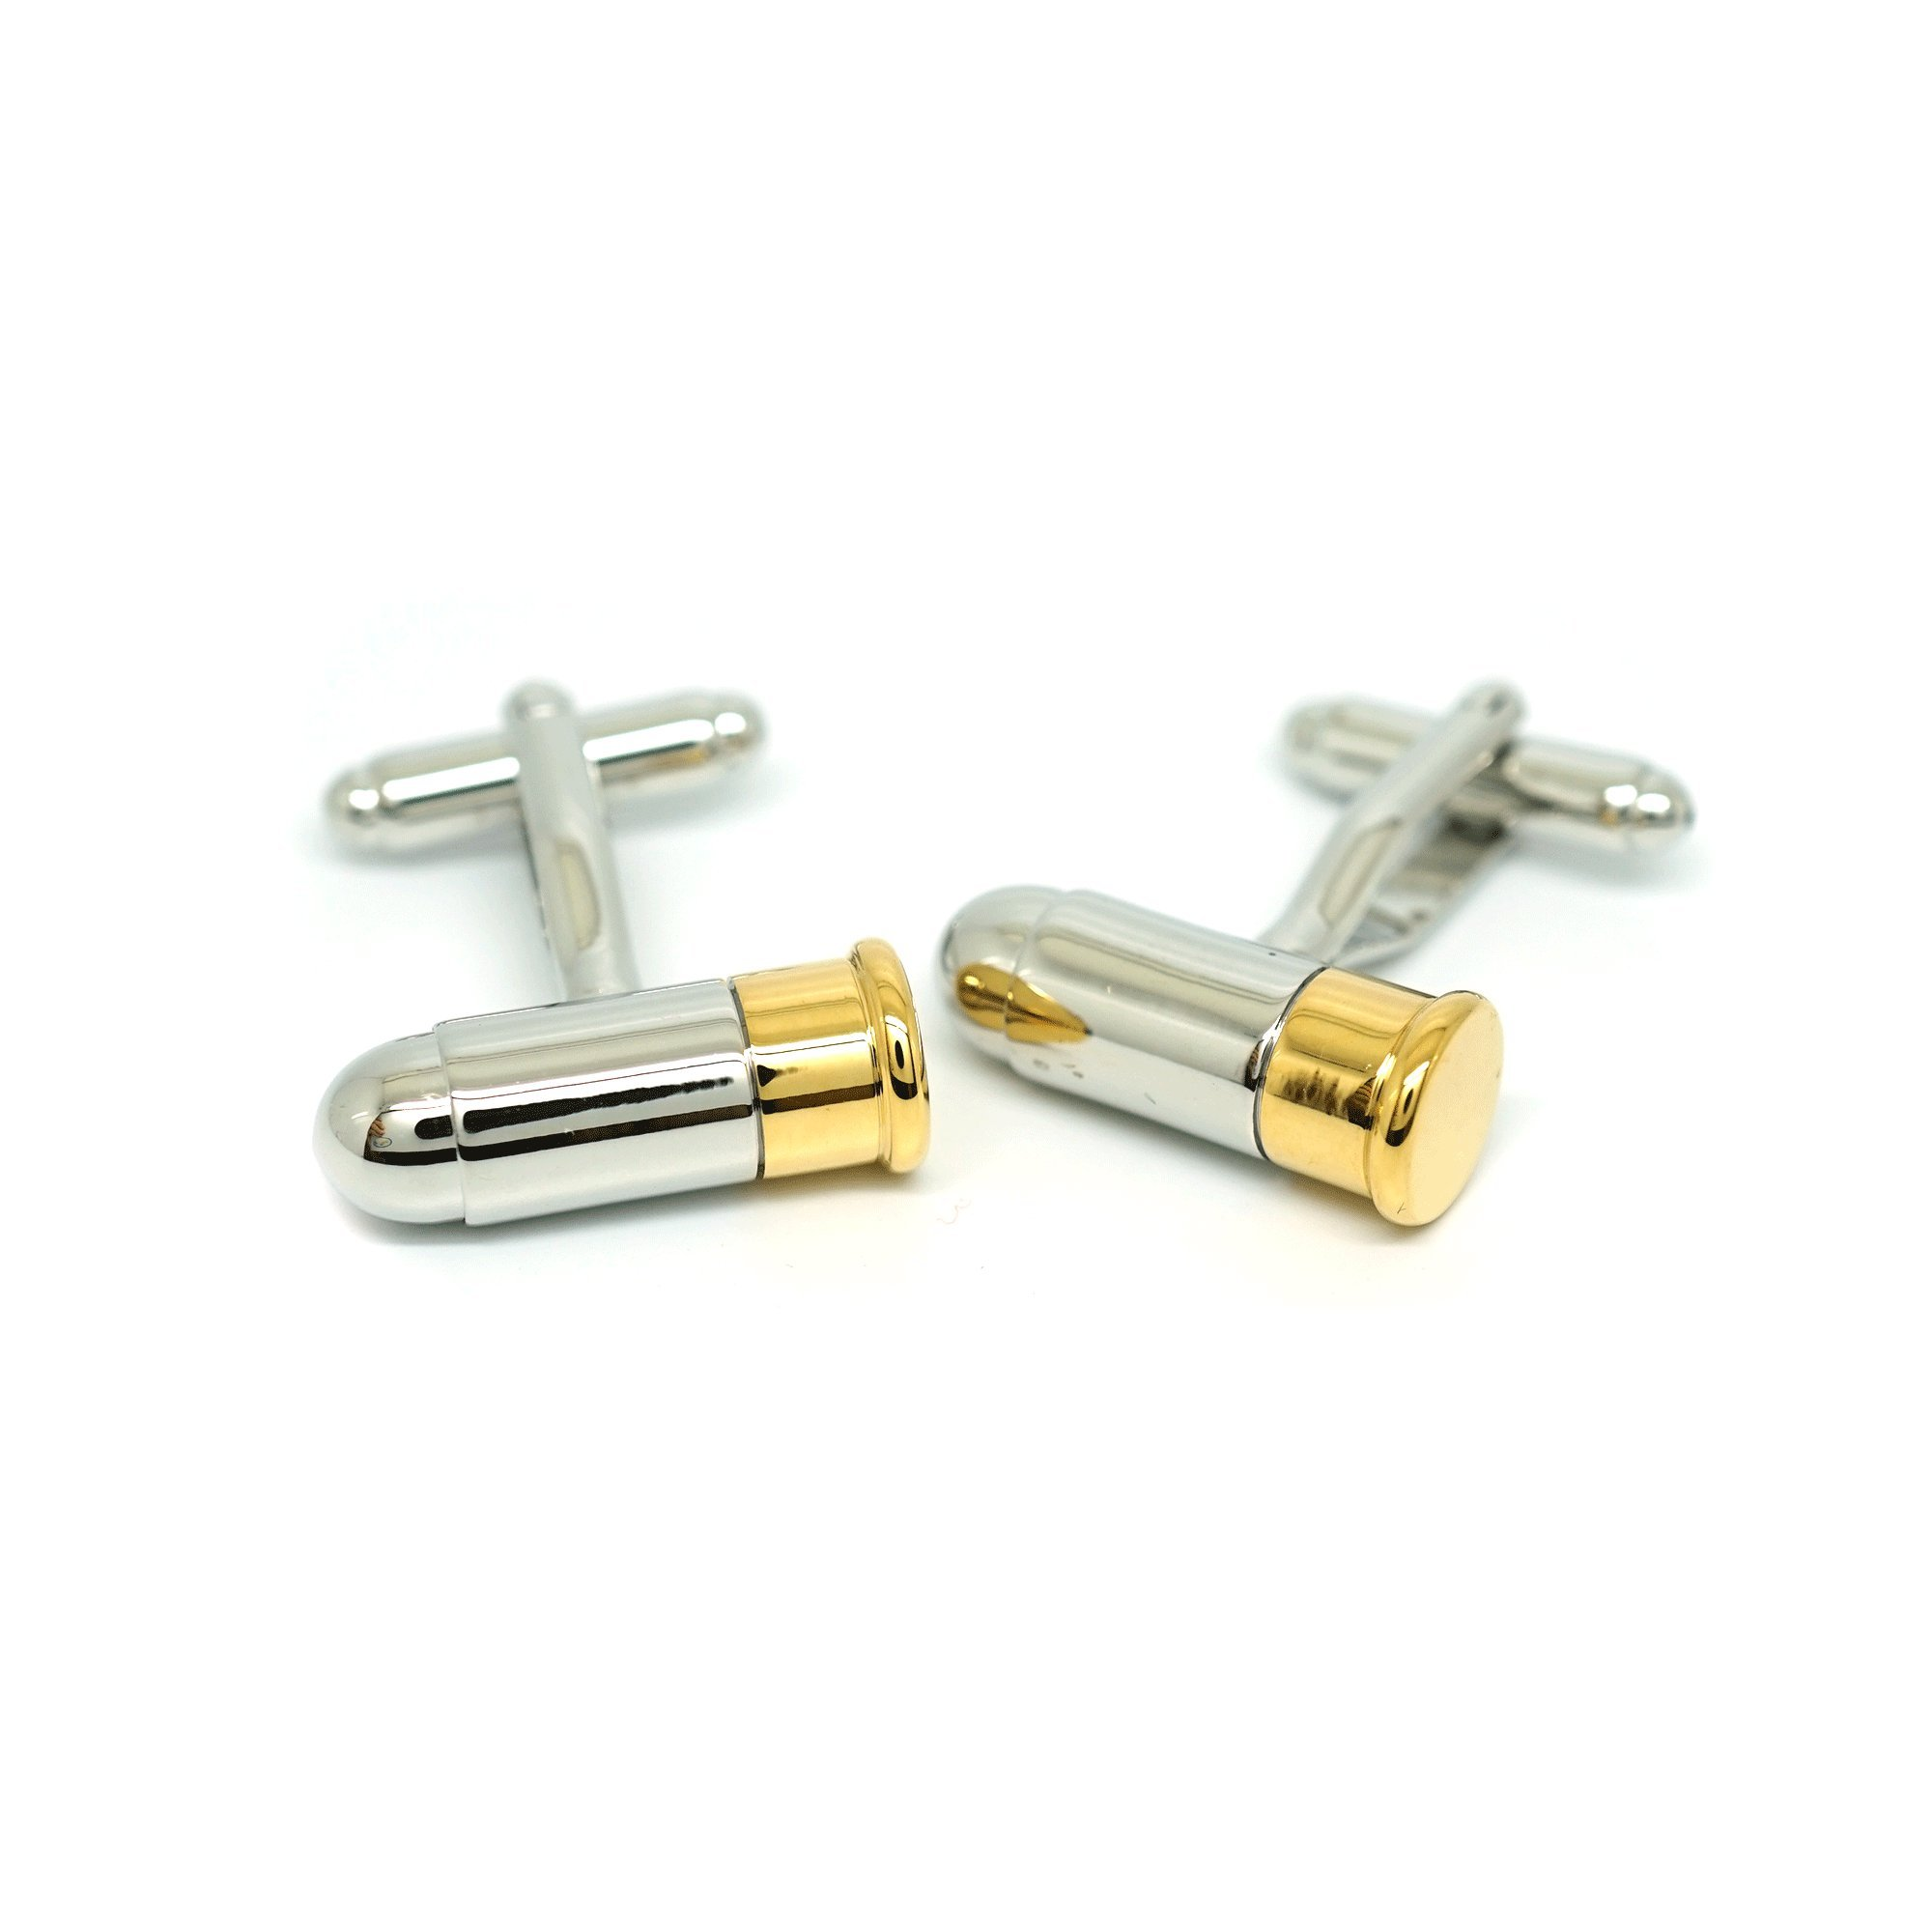 Teri's Boutique Gold Silver Tone Gun Bullet Men's Wedding Party Gift Cufflinks w/ Gift Box (Short)